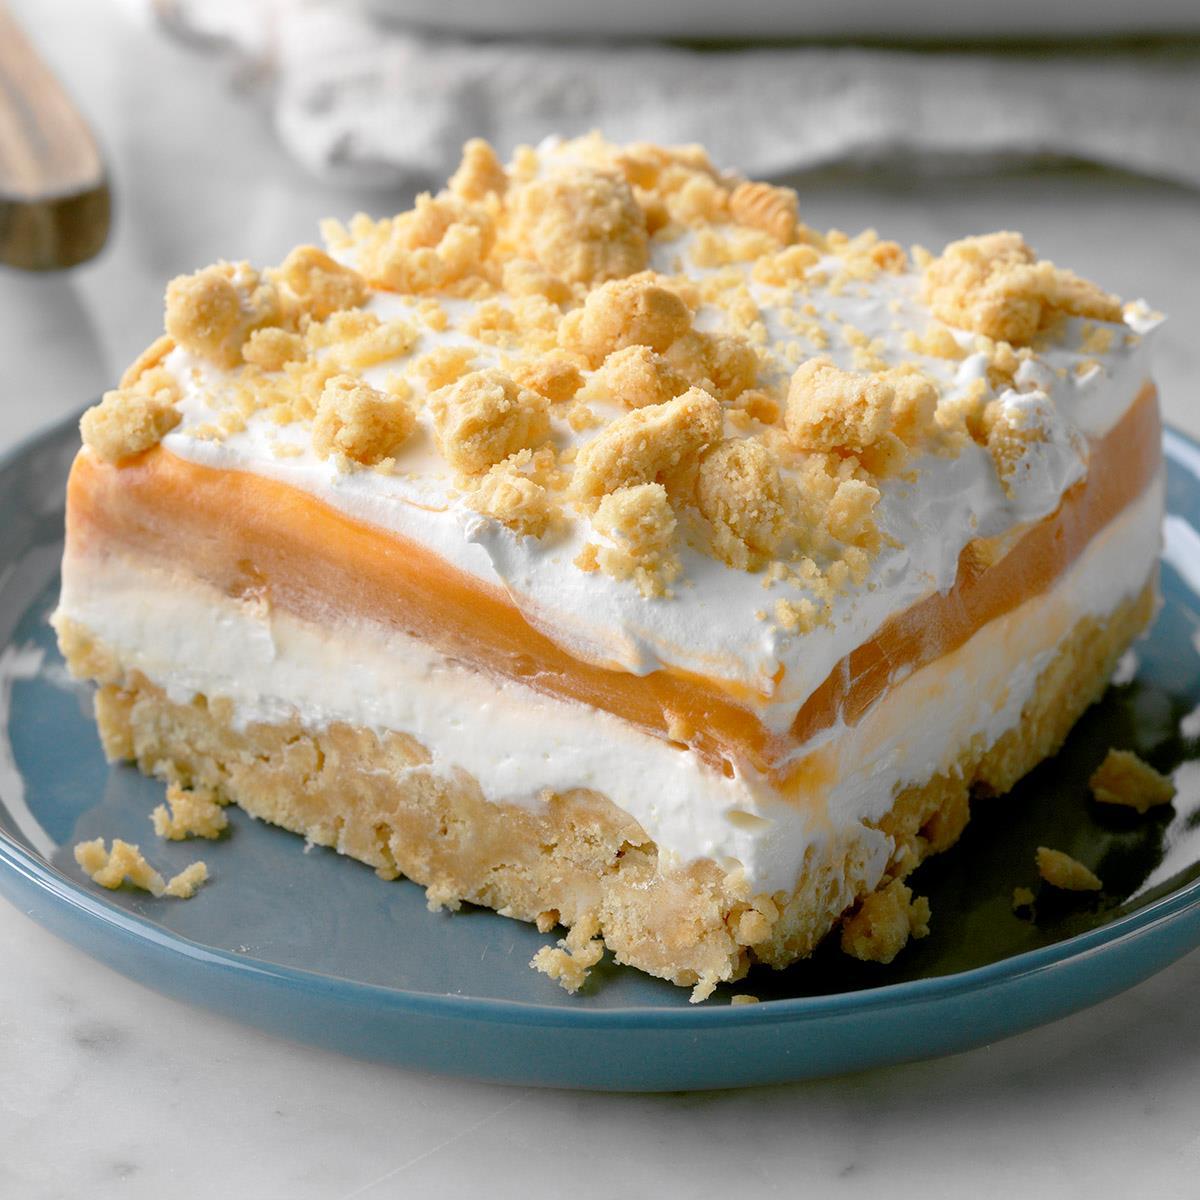 Butterscotch Pudding Torte image